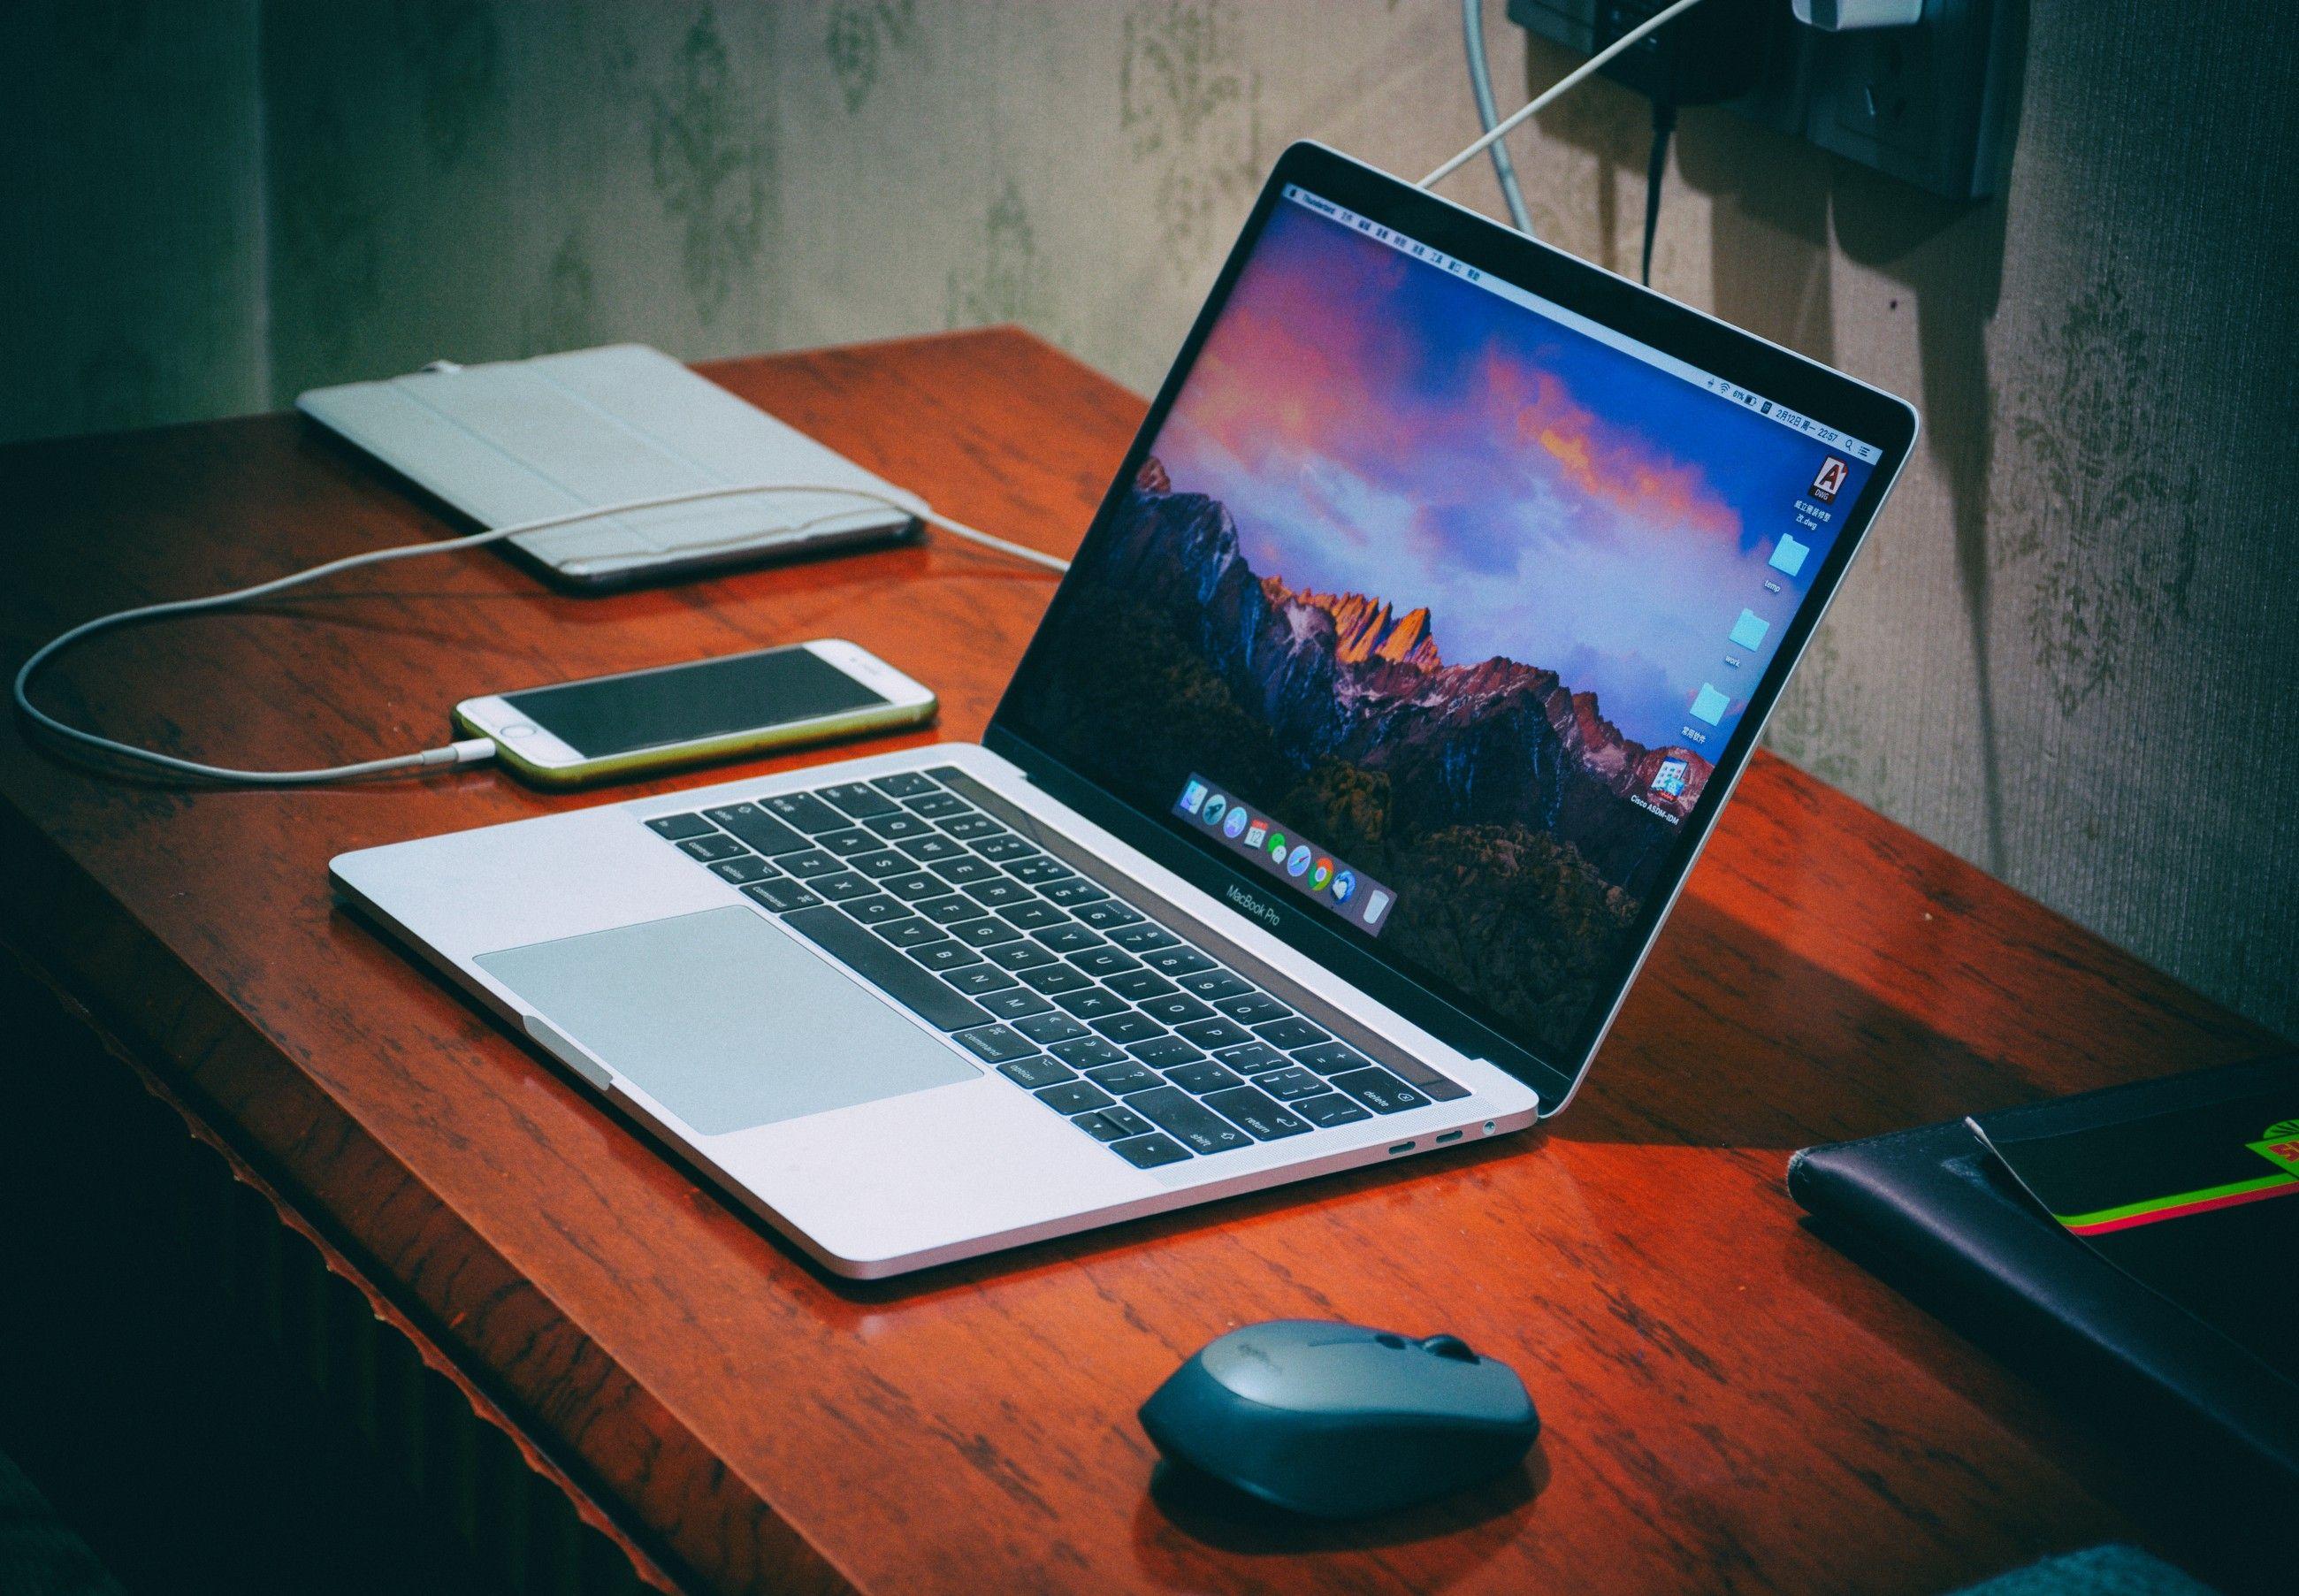 What Is The Copywith Operation In Flutter In 2020 Macbook Pro Macbook Apple Laptop Macbook